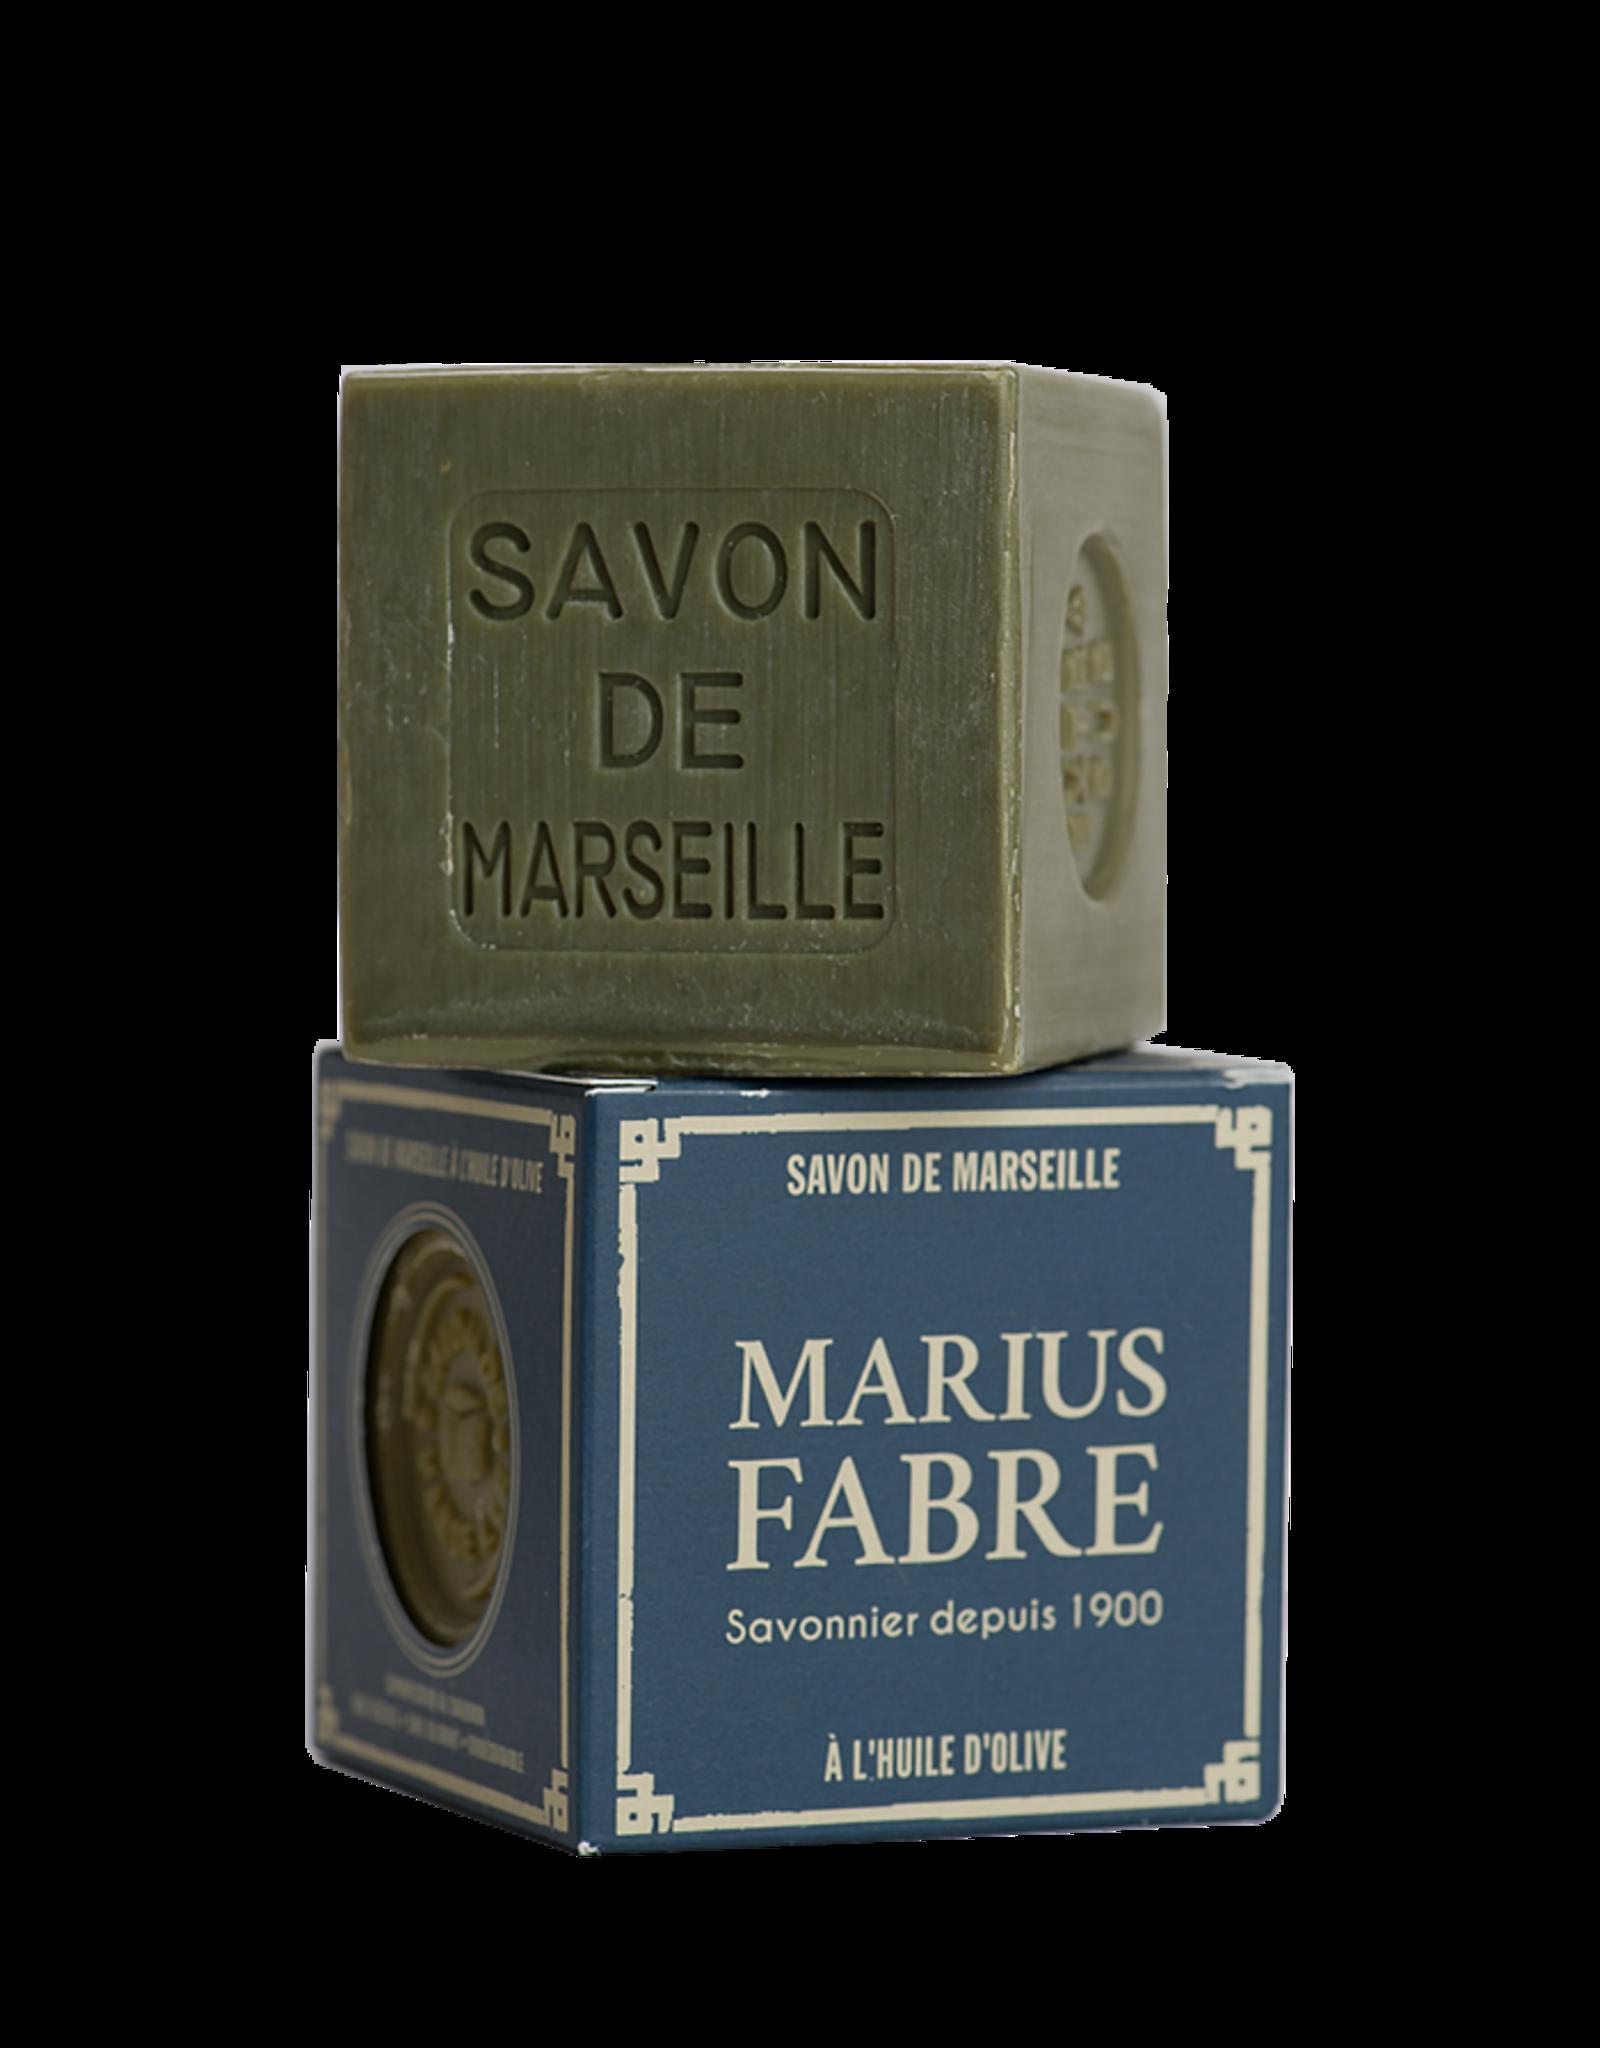 Marius Fabre Savon de Marseille 400g Soap